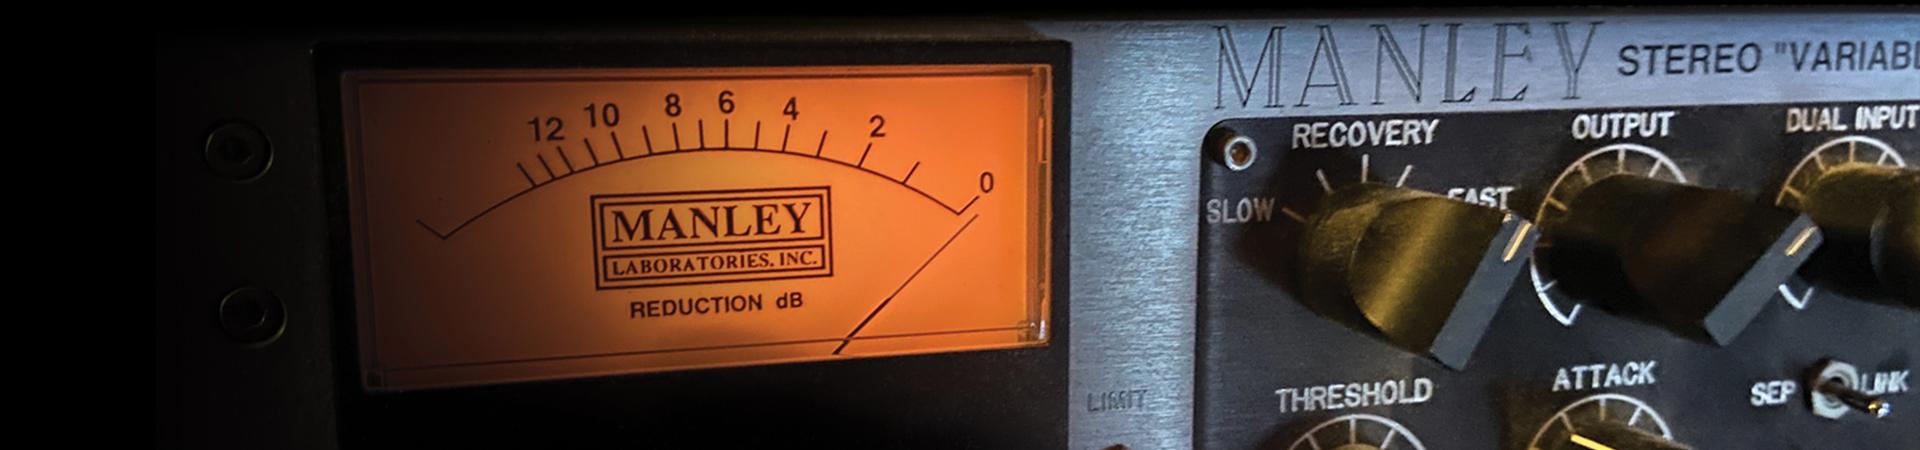 Kompresor Manley Stereo Variable Mu